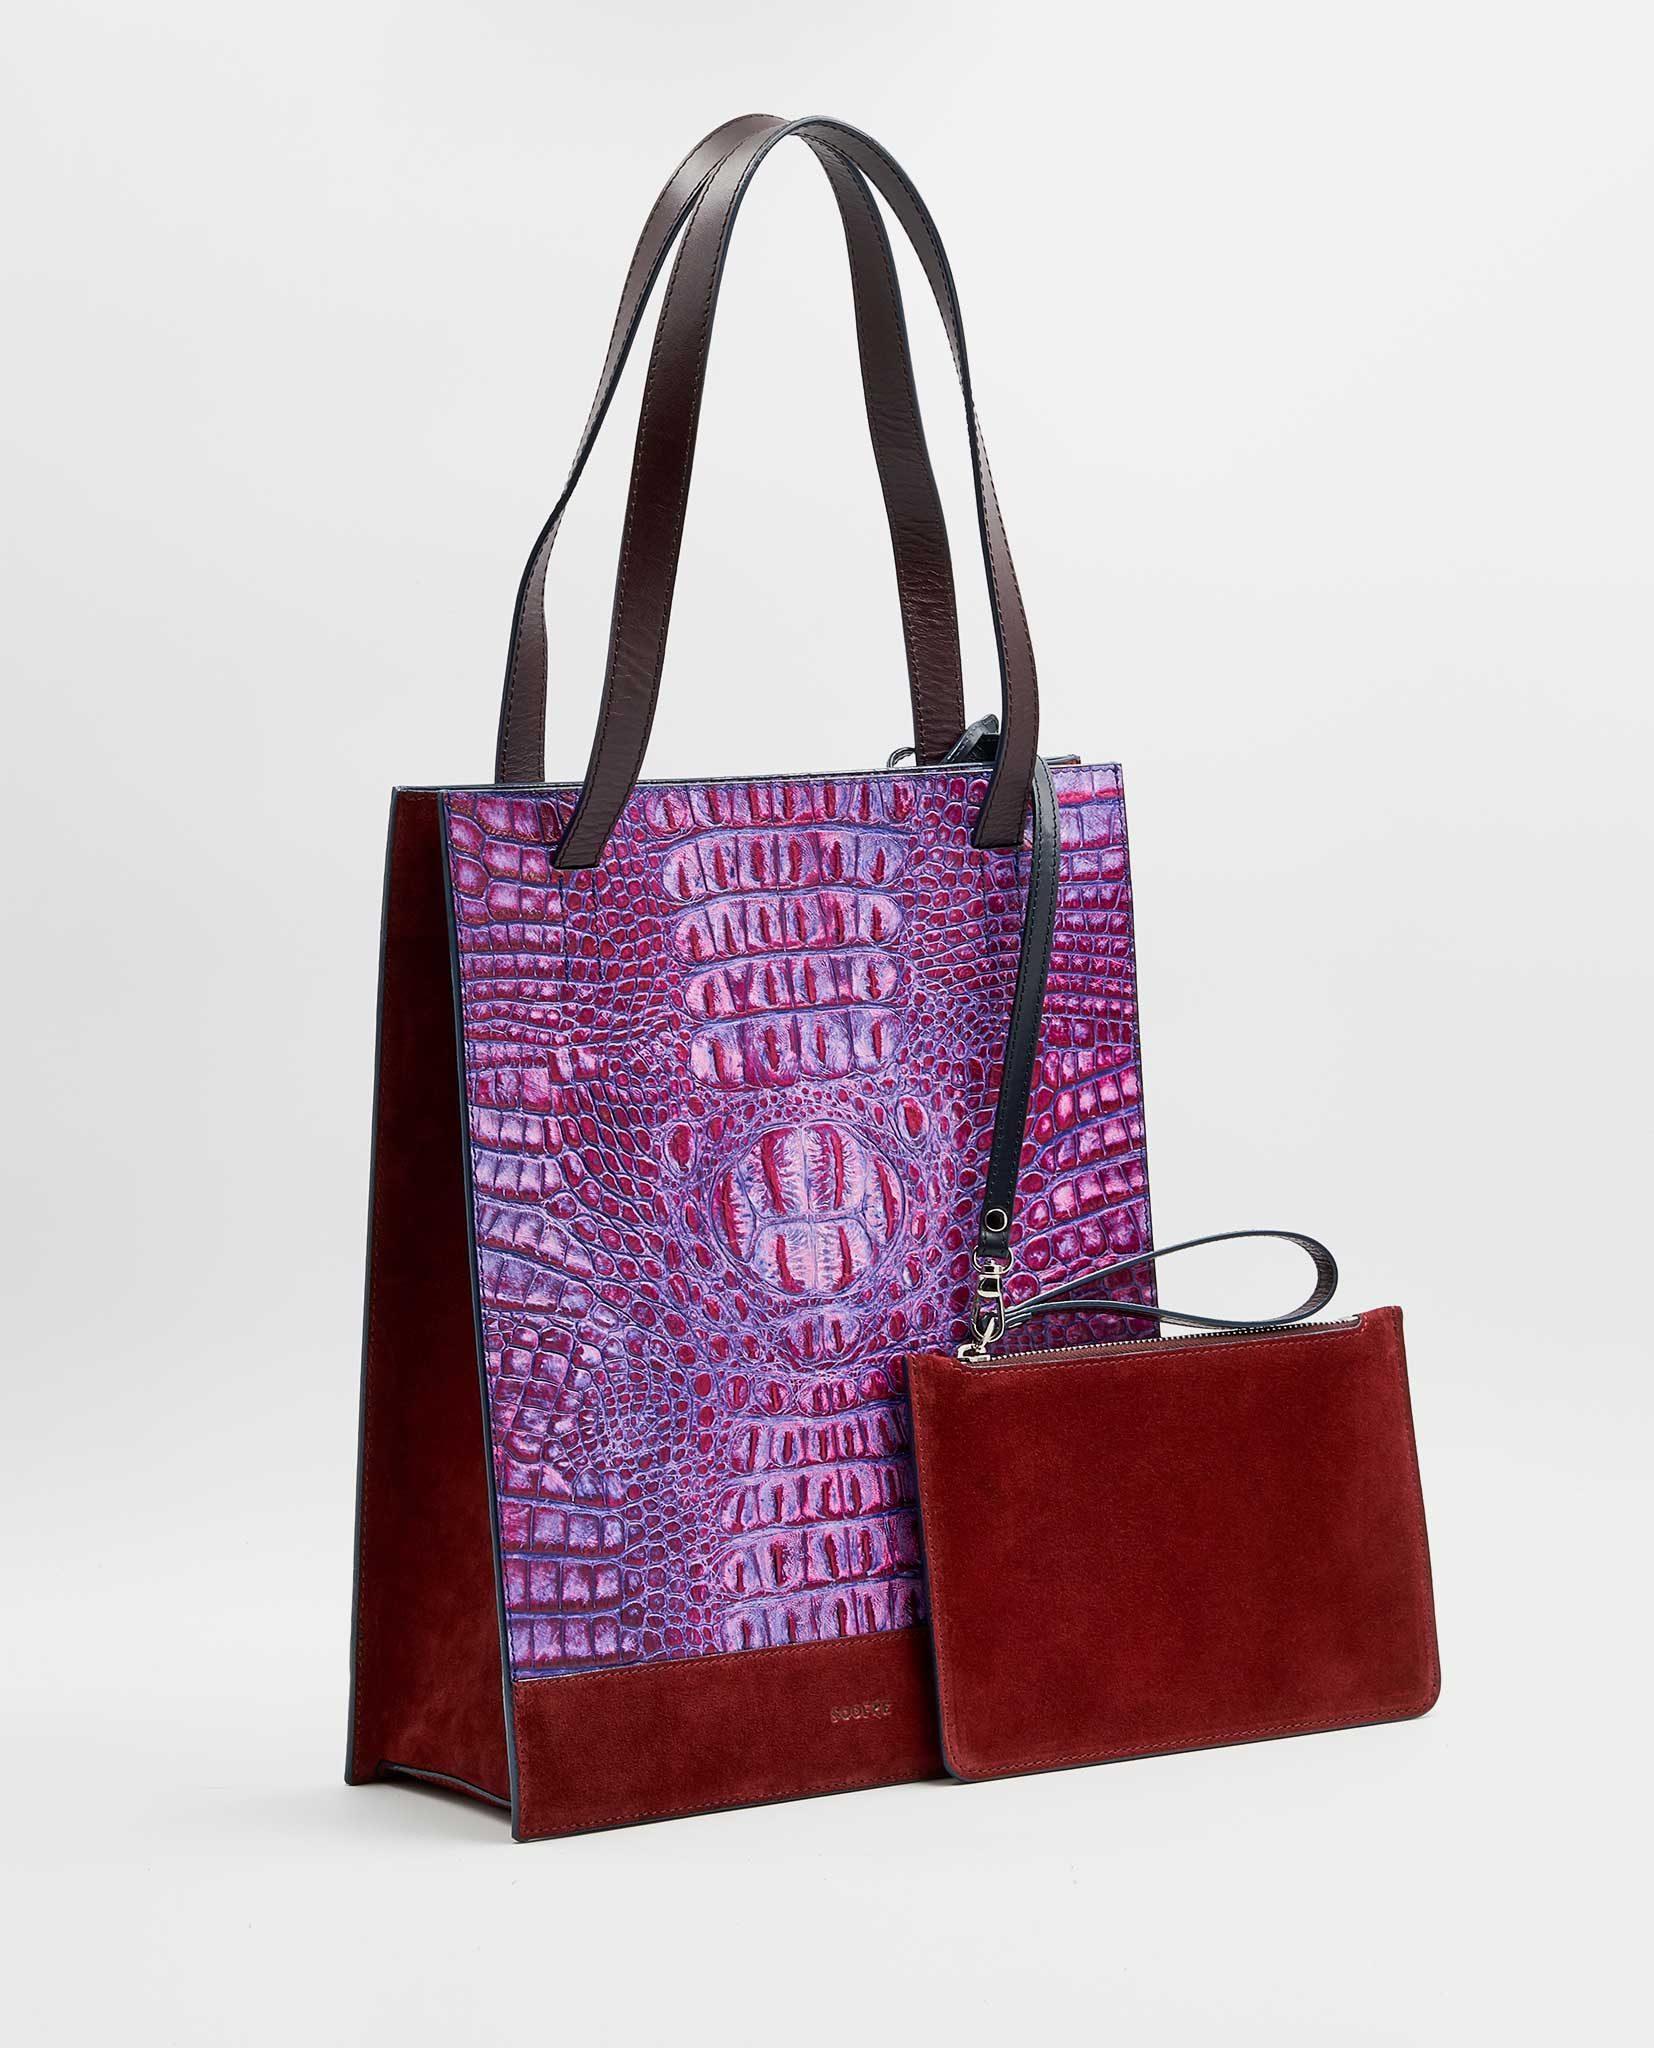 SOOFRE-Berlin-unique-Shopper-Bag-croco-purple-lilac-burgundy-SIDES